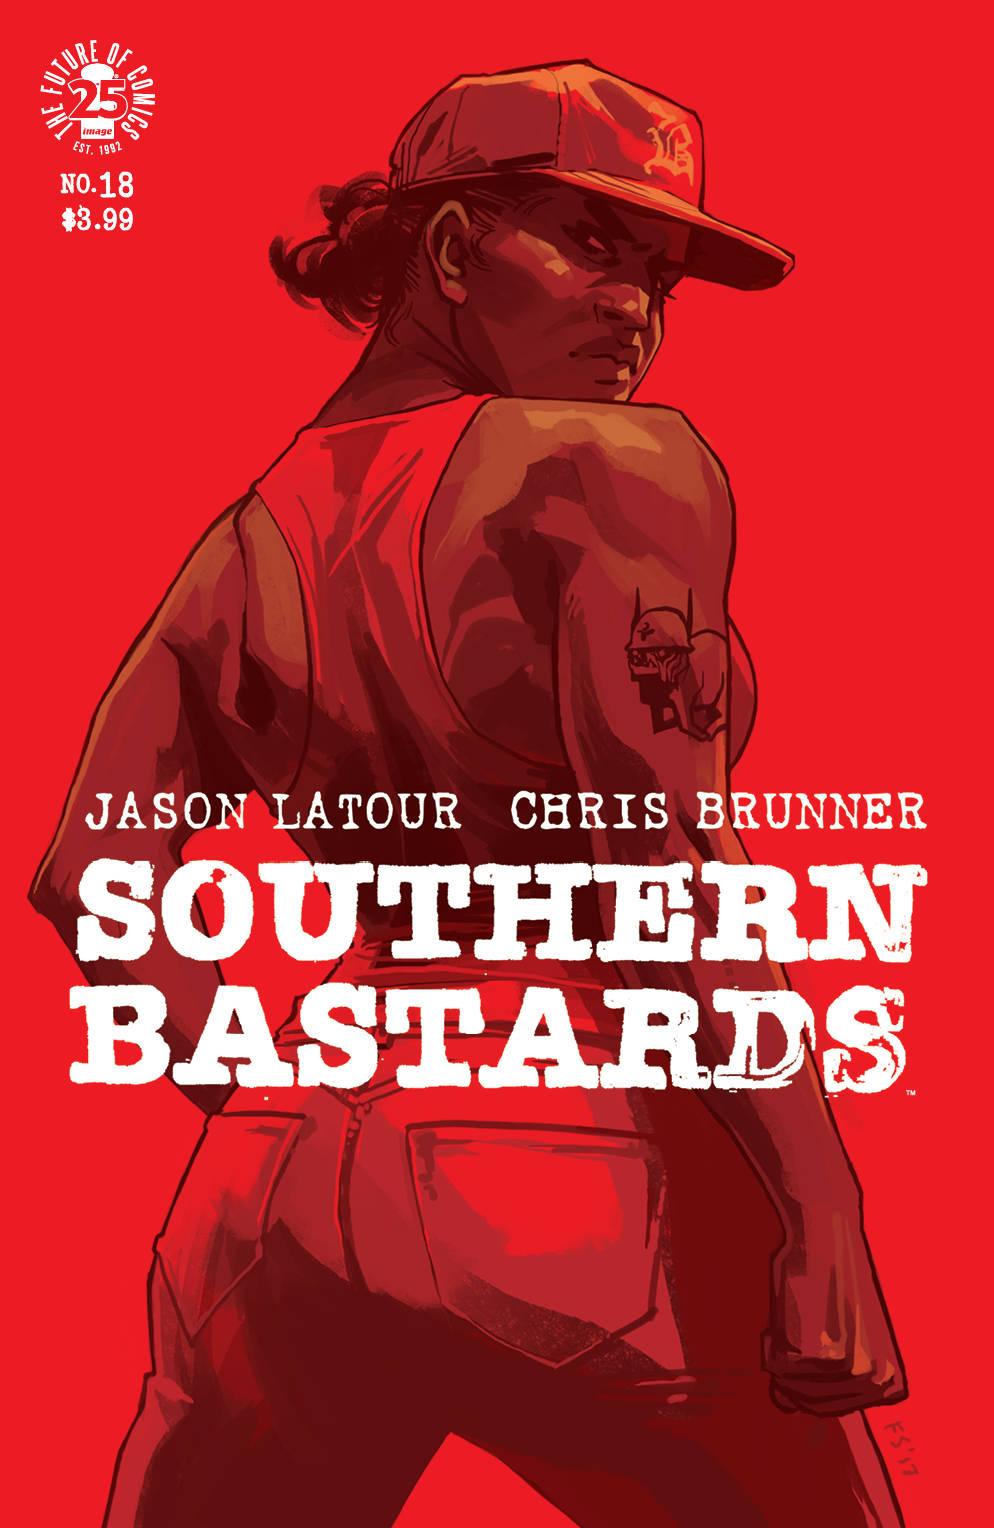 Southern2.jpg